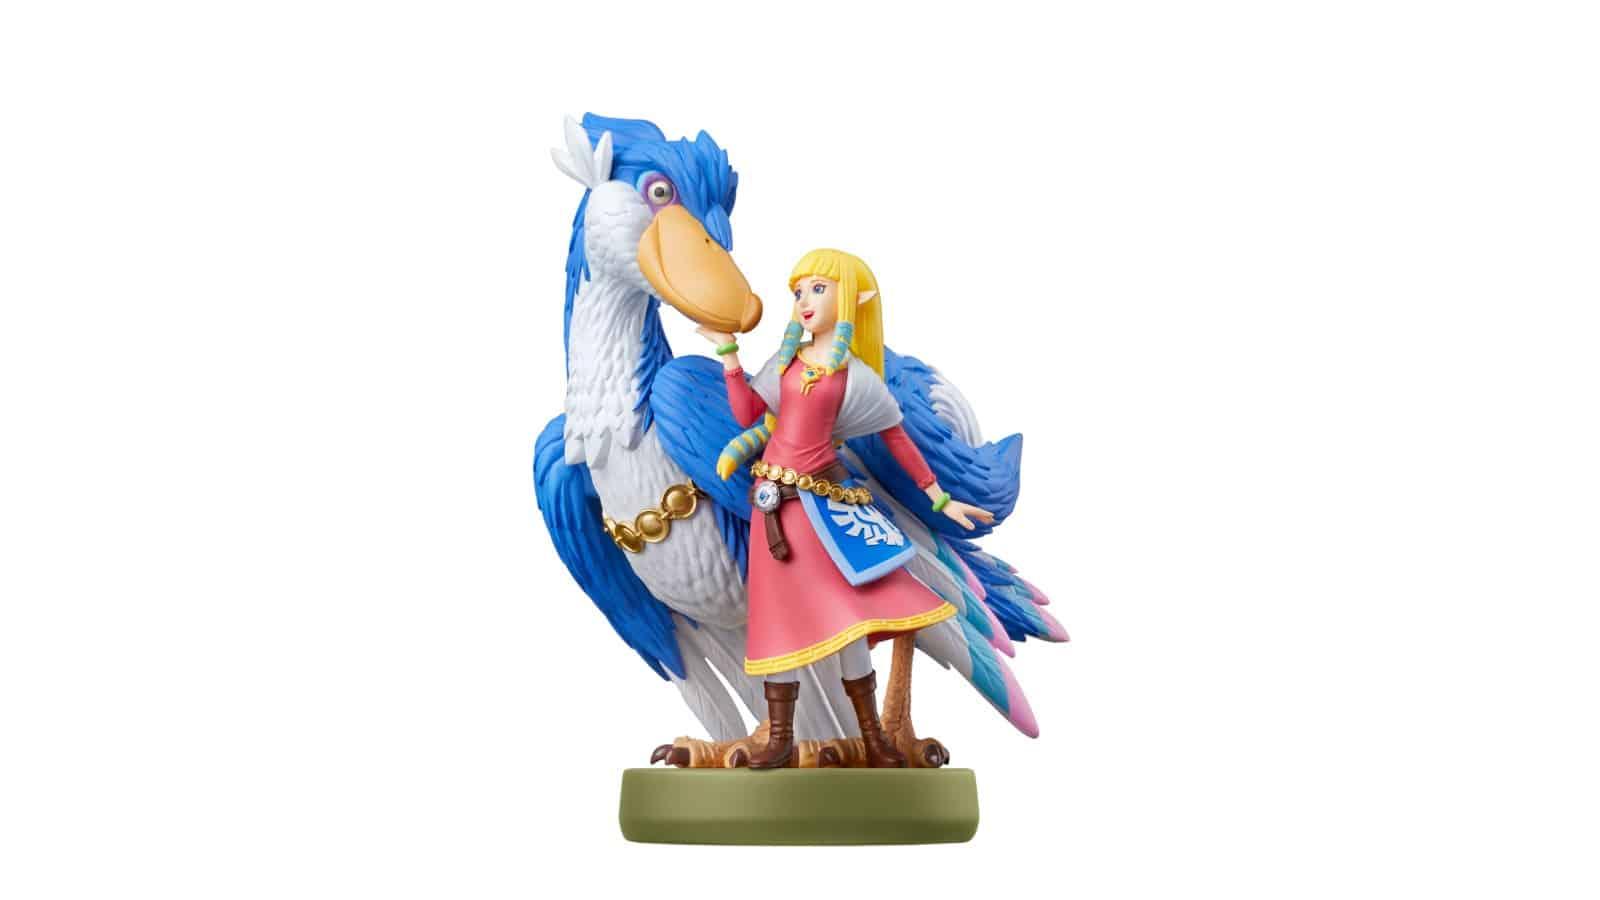 אמיבו - Zelda & Loftwing (סדרת The Legend of Zelda)